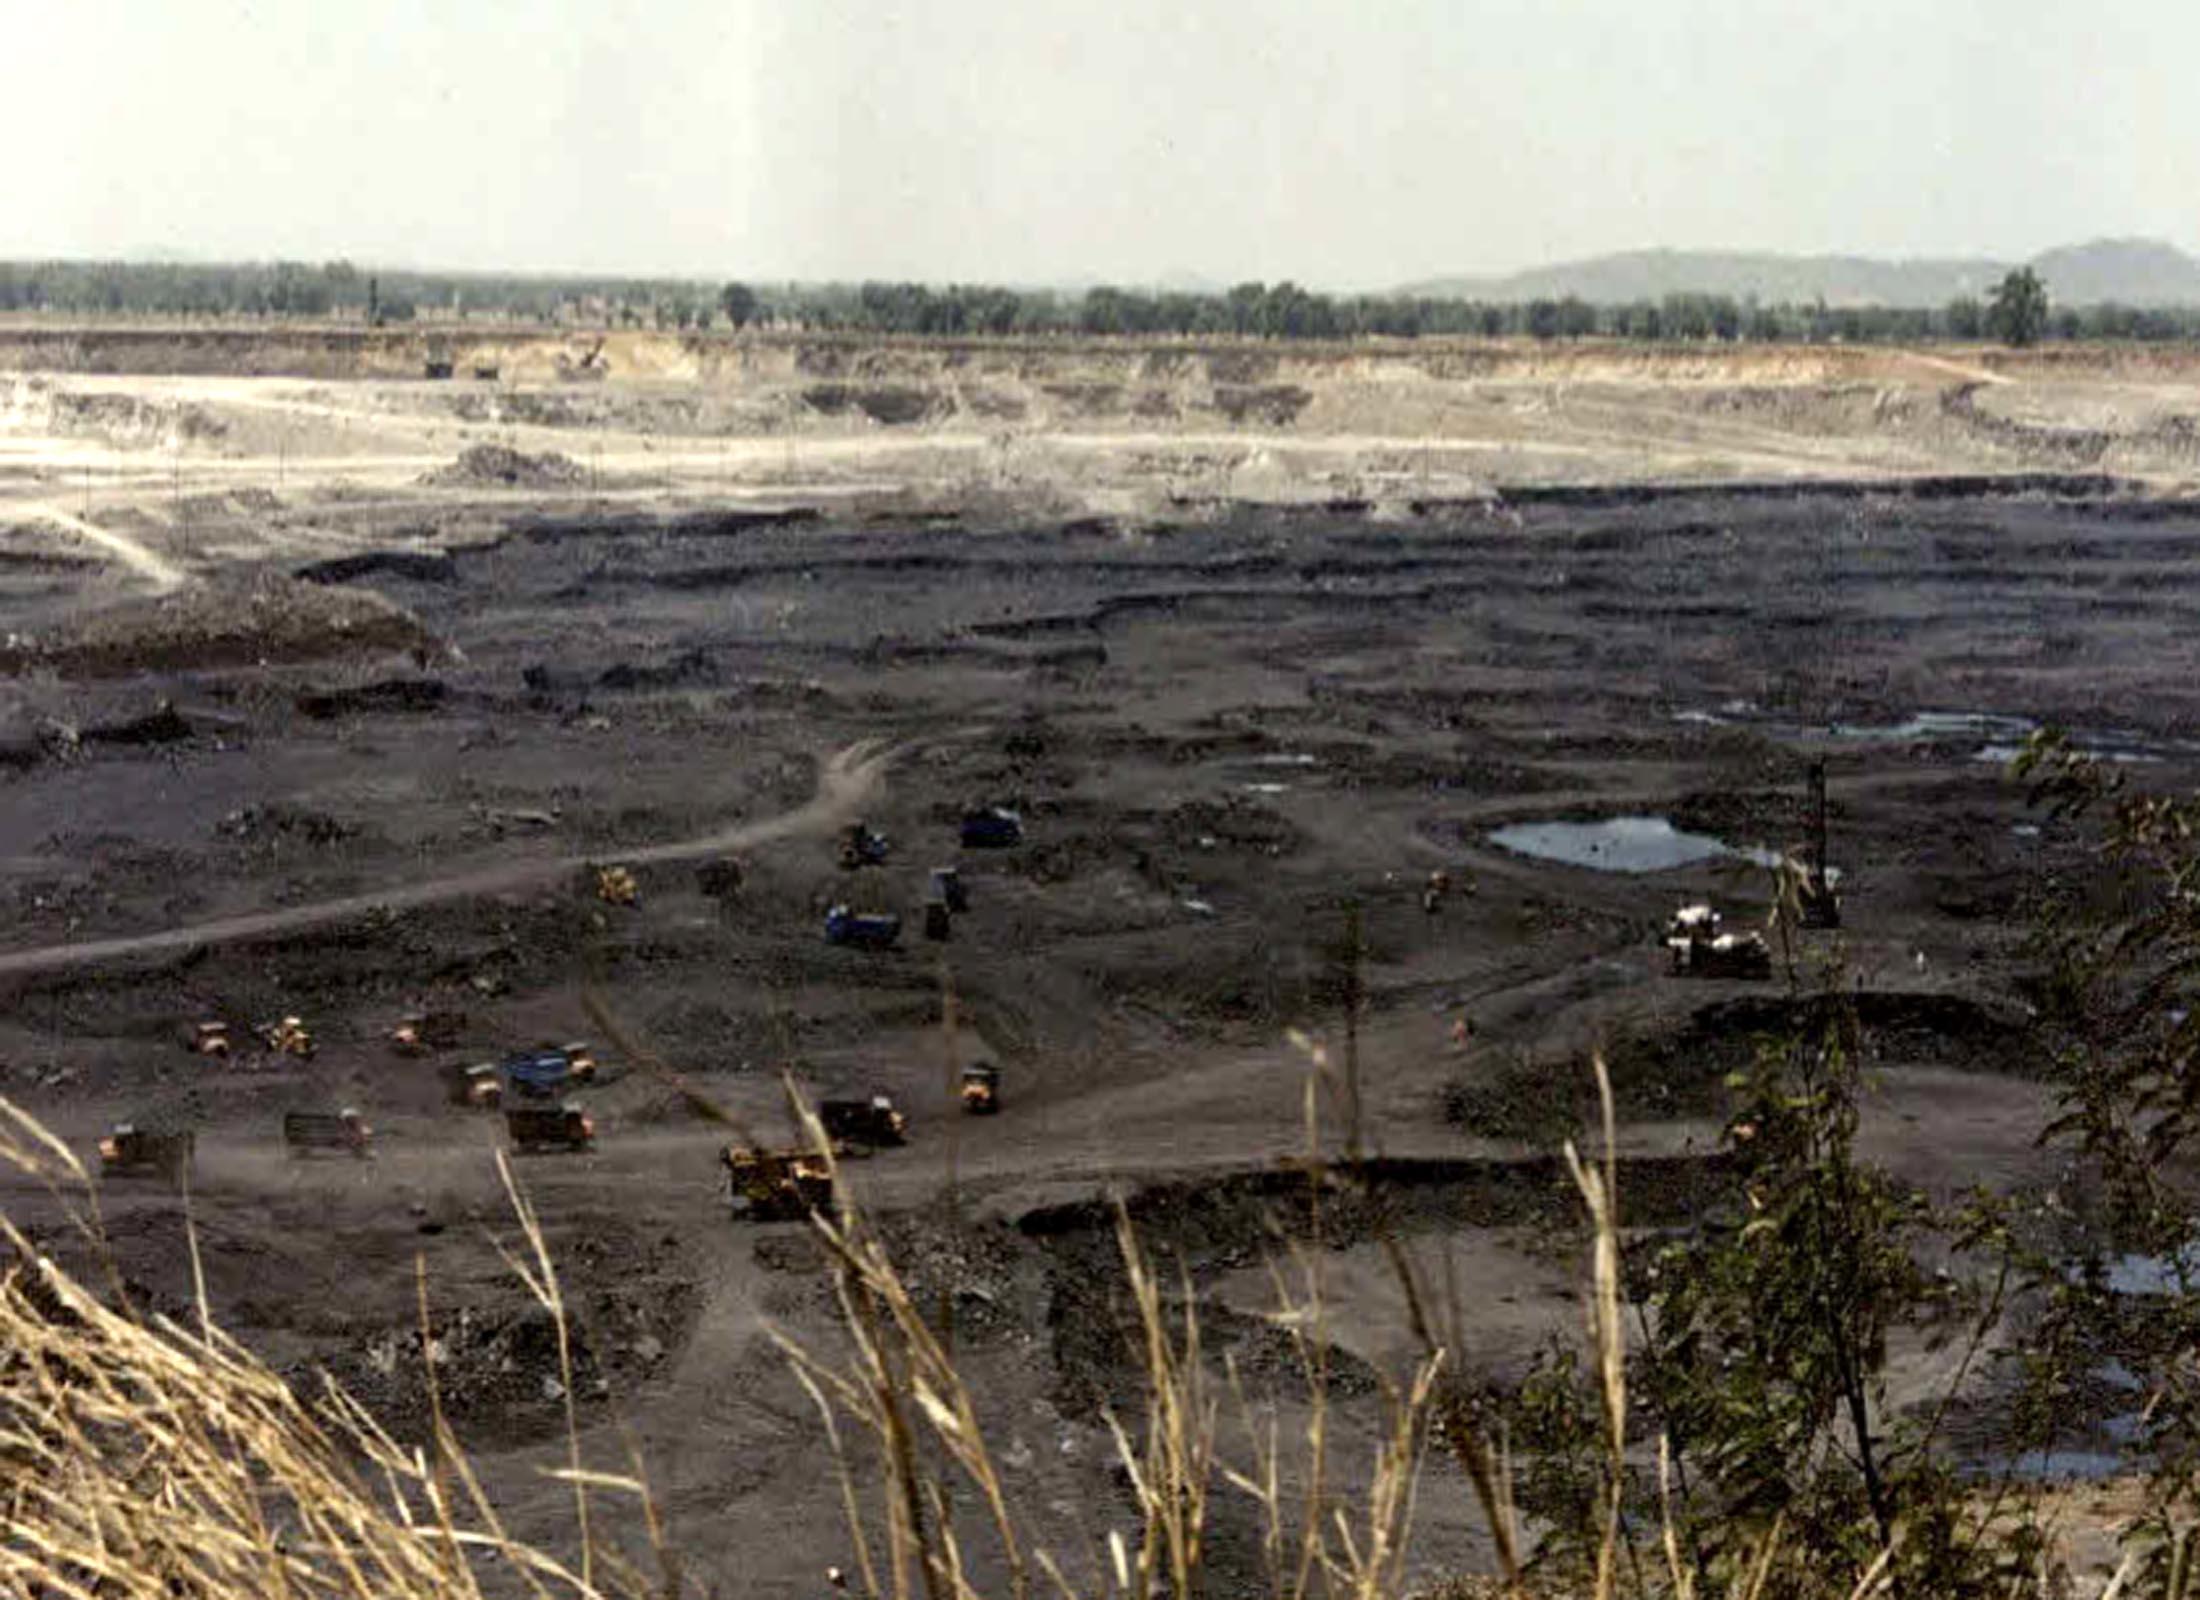 गेवरा खनन क्षेत्र: भू-दृश्य